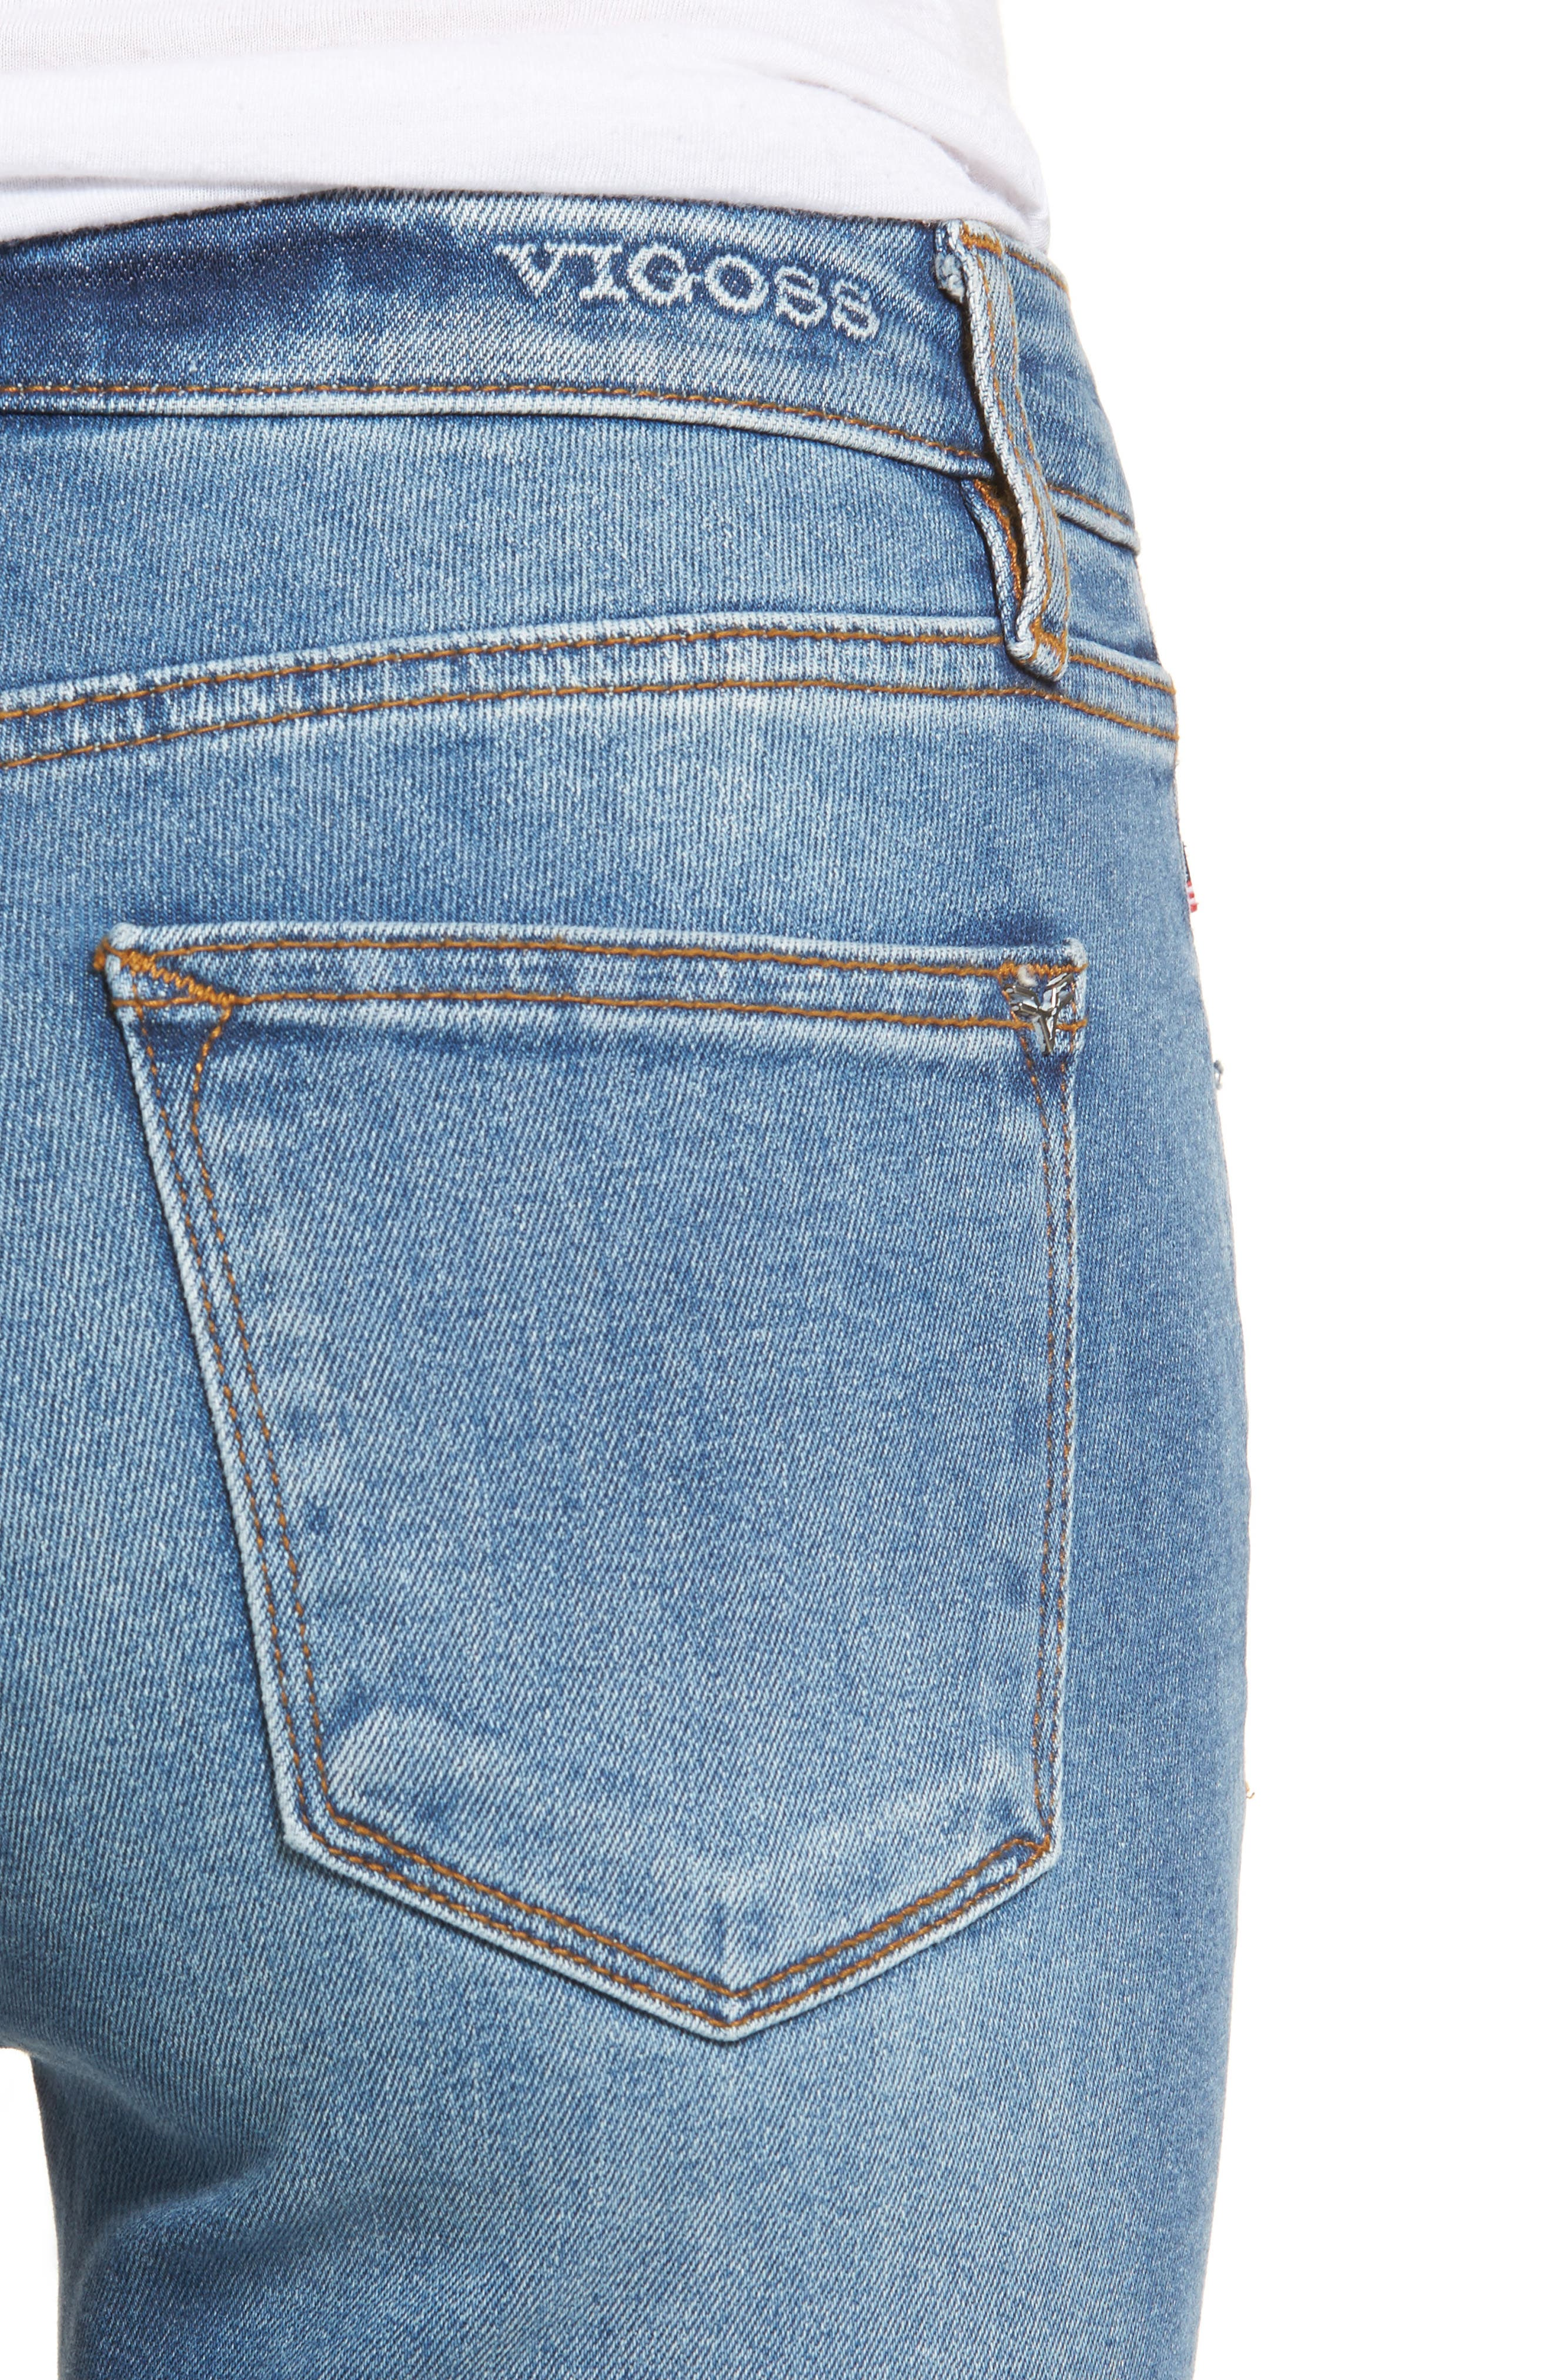 Marley Raw Hem Super Skinny Jeans,                             Alternate thumbnail 4, color,                             461